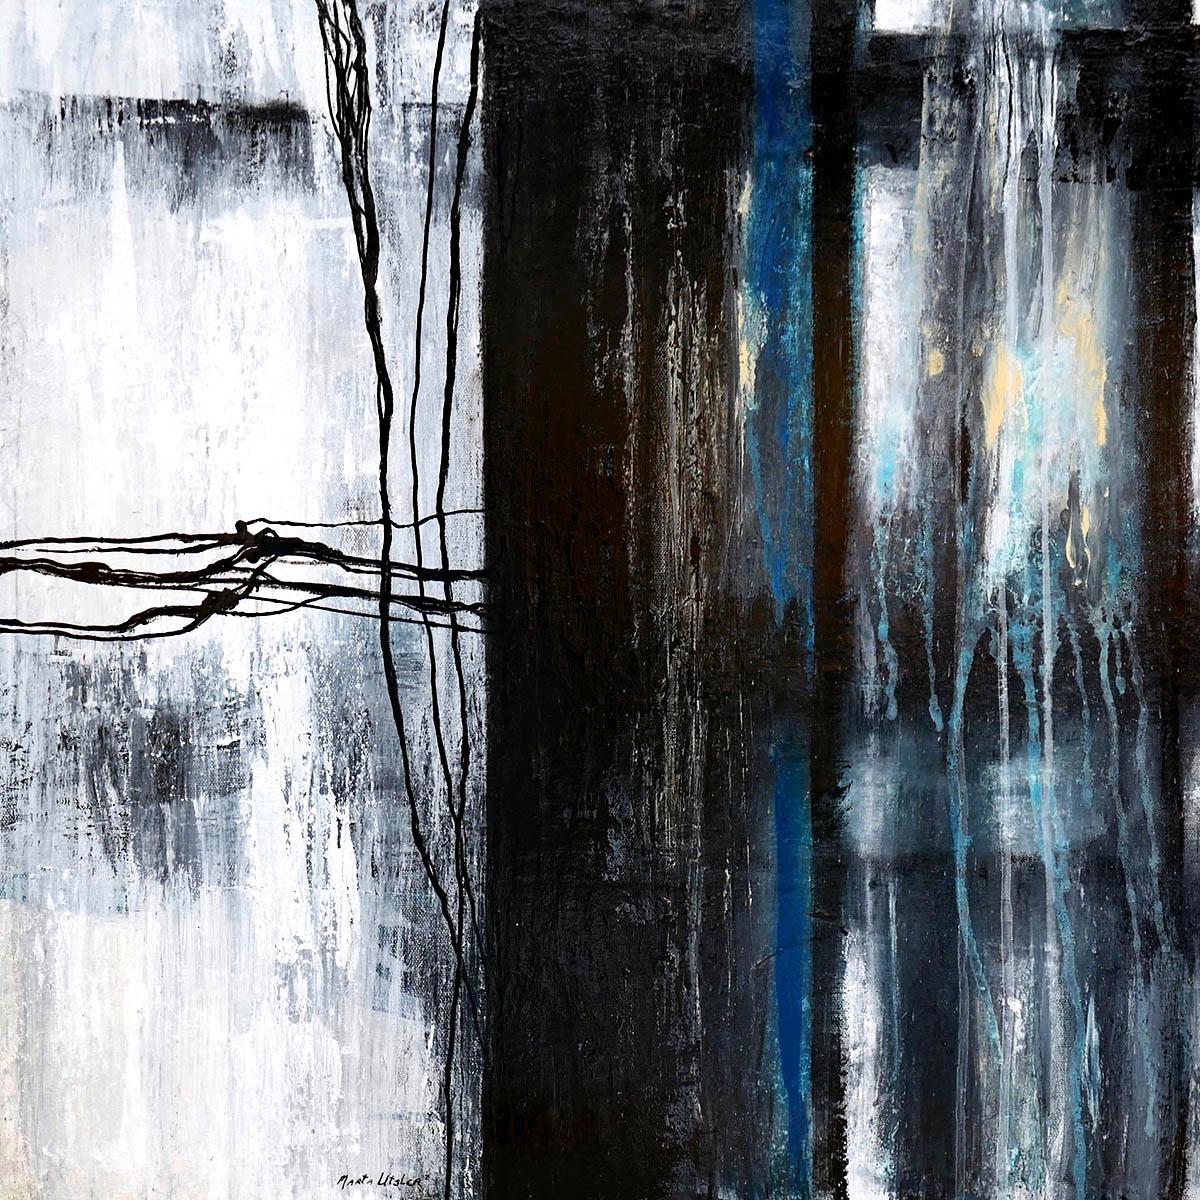 Marta Utsler, 'Dual Narratives Part 1', acrylic on canvas